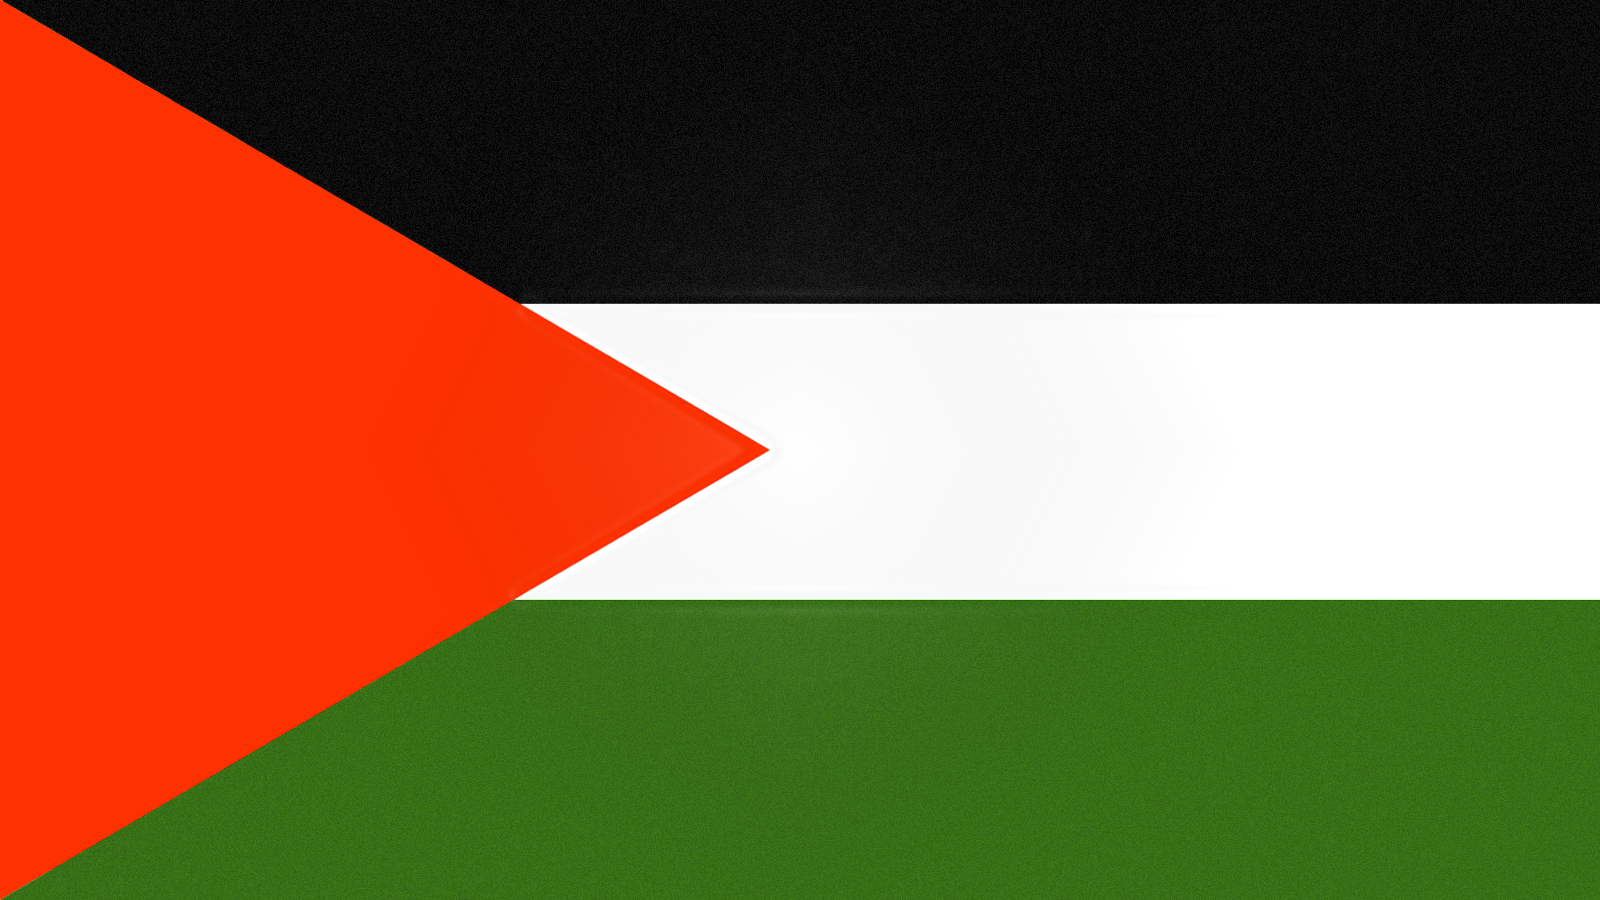 Beautiful Girl Pictures Wallpaper Hd Wallpaper Download Original Palestine Flag Wide Hd